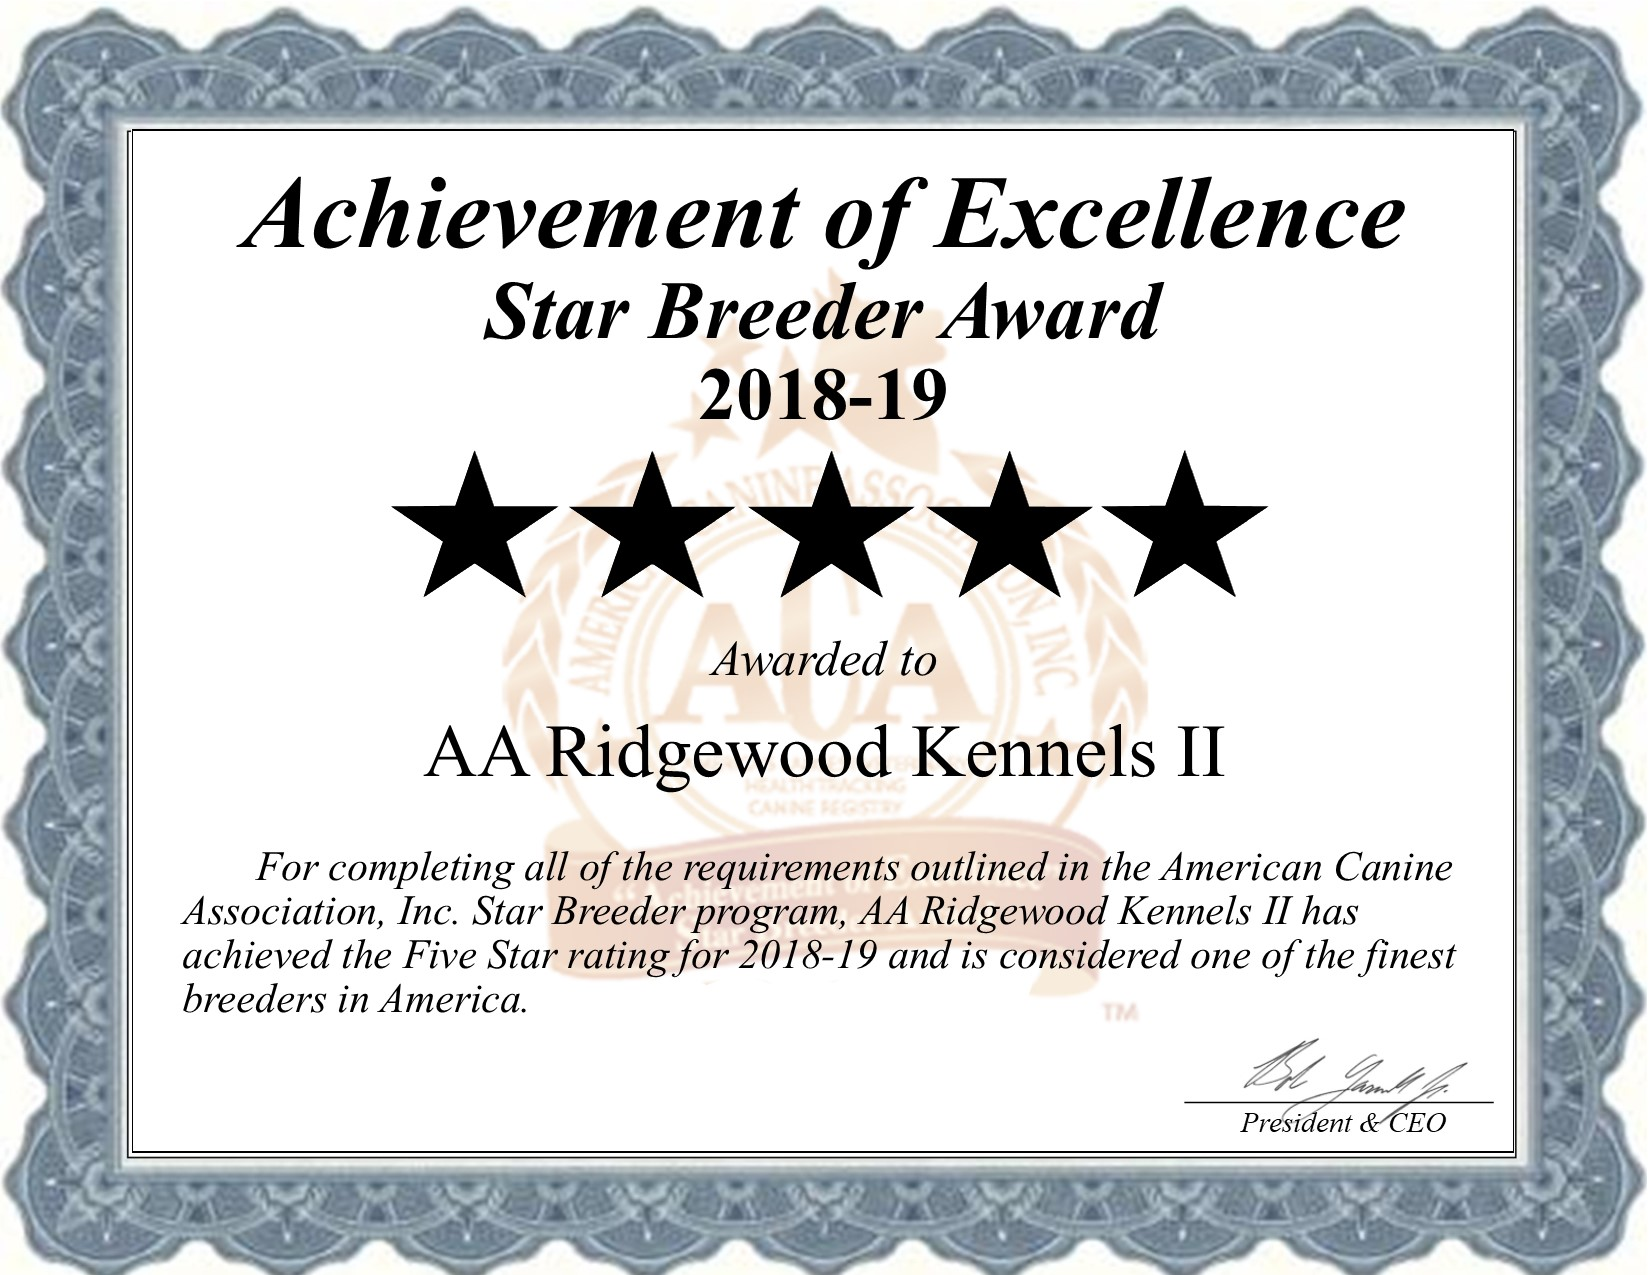 AA, Ridgewood, Kennels, II, certificate, dog, breeder, aa-ridgewood-kennels-ii, dog-breeder, gap, shrewsbury, pa, pennsylvania, usda, puppy, puppies, ACA, ICA, star, 5-star, ridge, wood, kennel